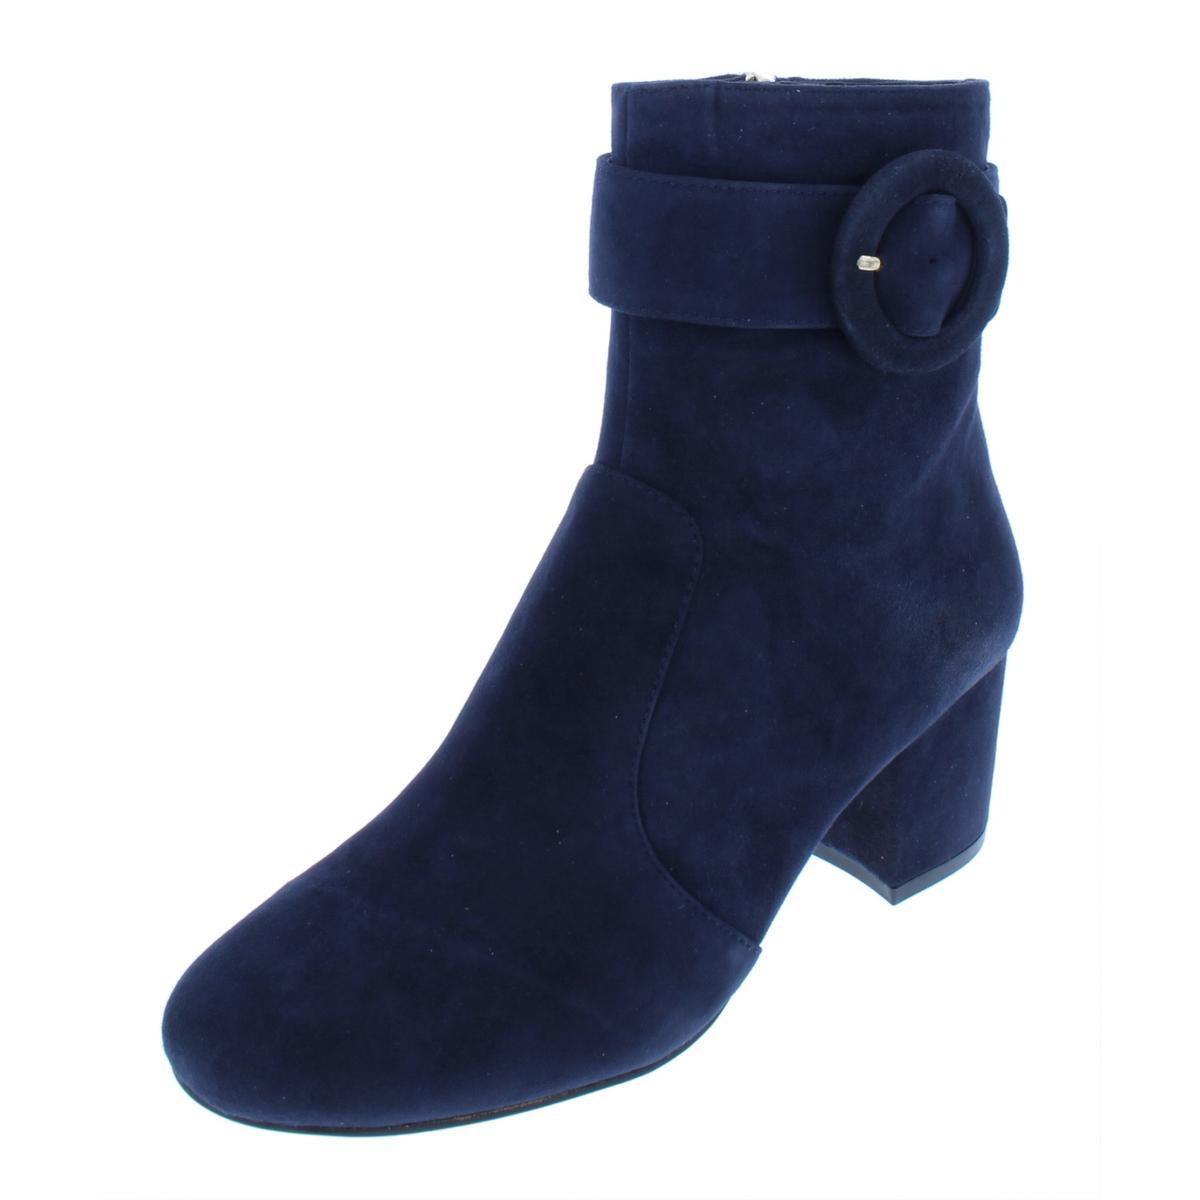 Nine West Damenschuhe Quilby Navy Suede Ankle Booties Schuhes 5 Medium Medium 5 (B,M) BHFO 6355 16e9e4